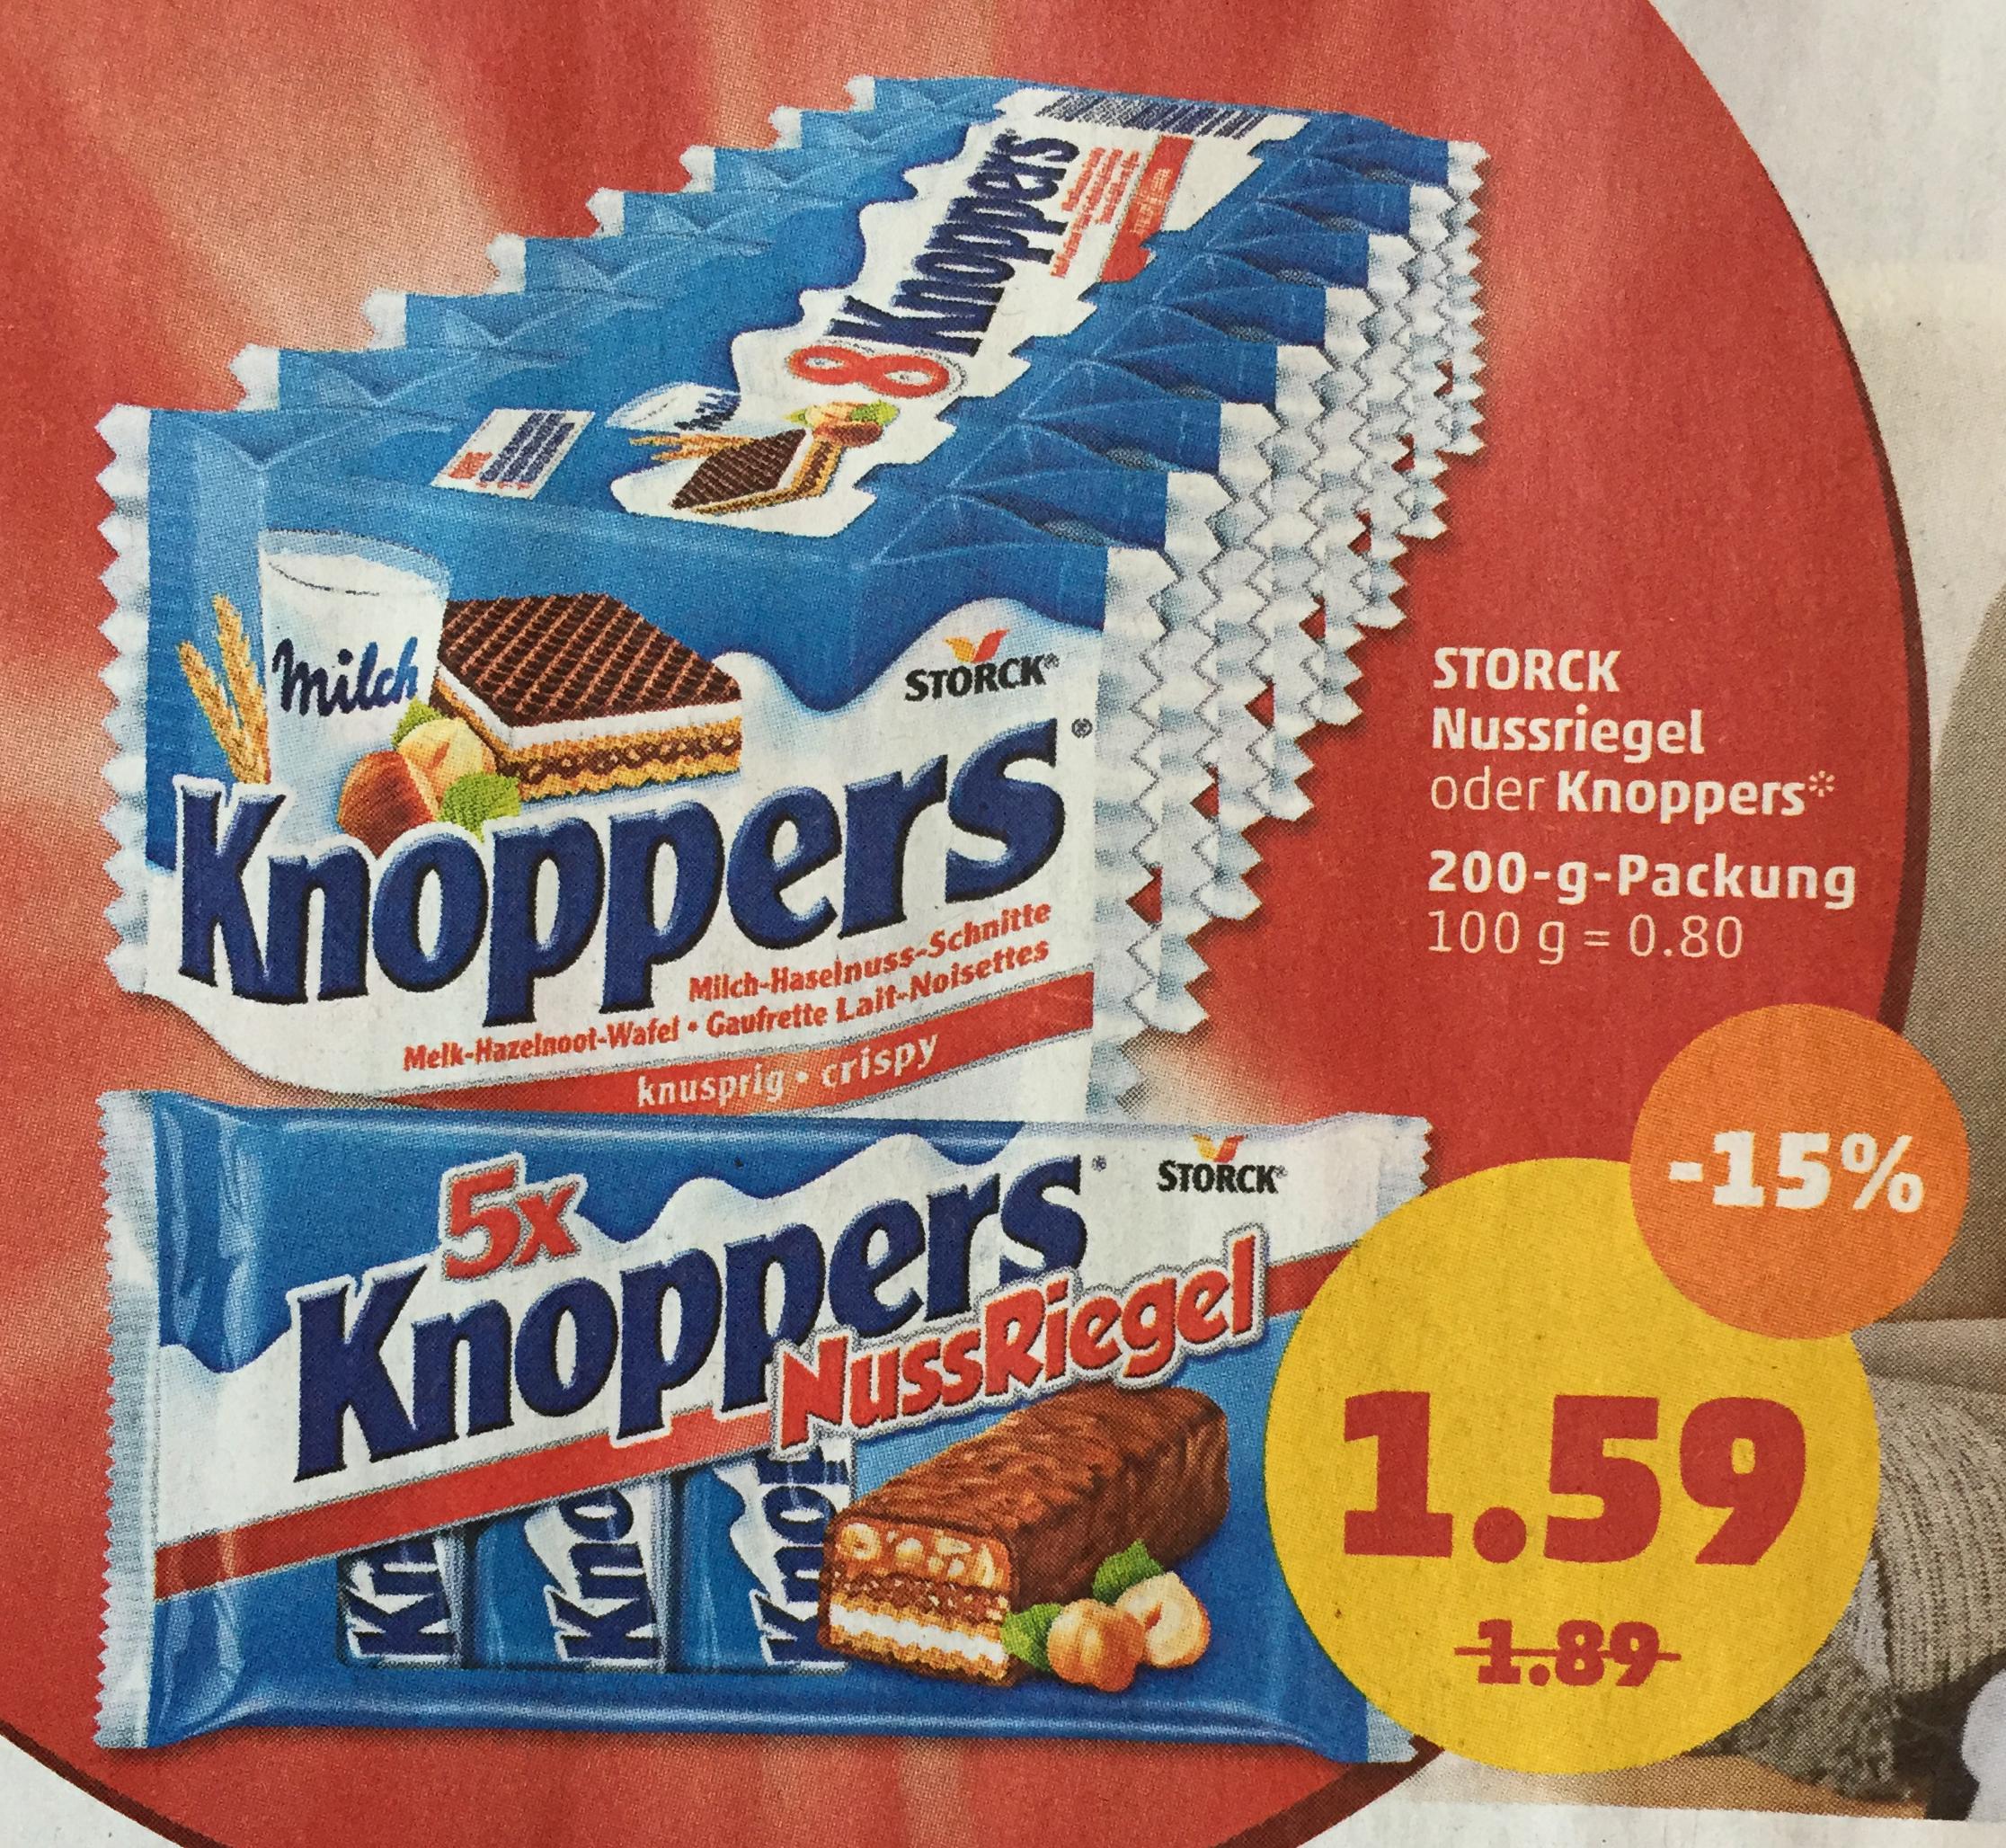 5er Pack Knoppers Nussriegel für 1,59€ ab 09.04.18 bei Penny